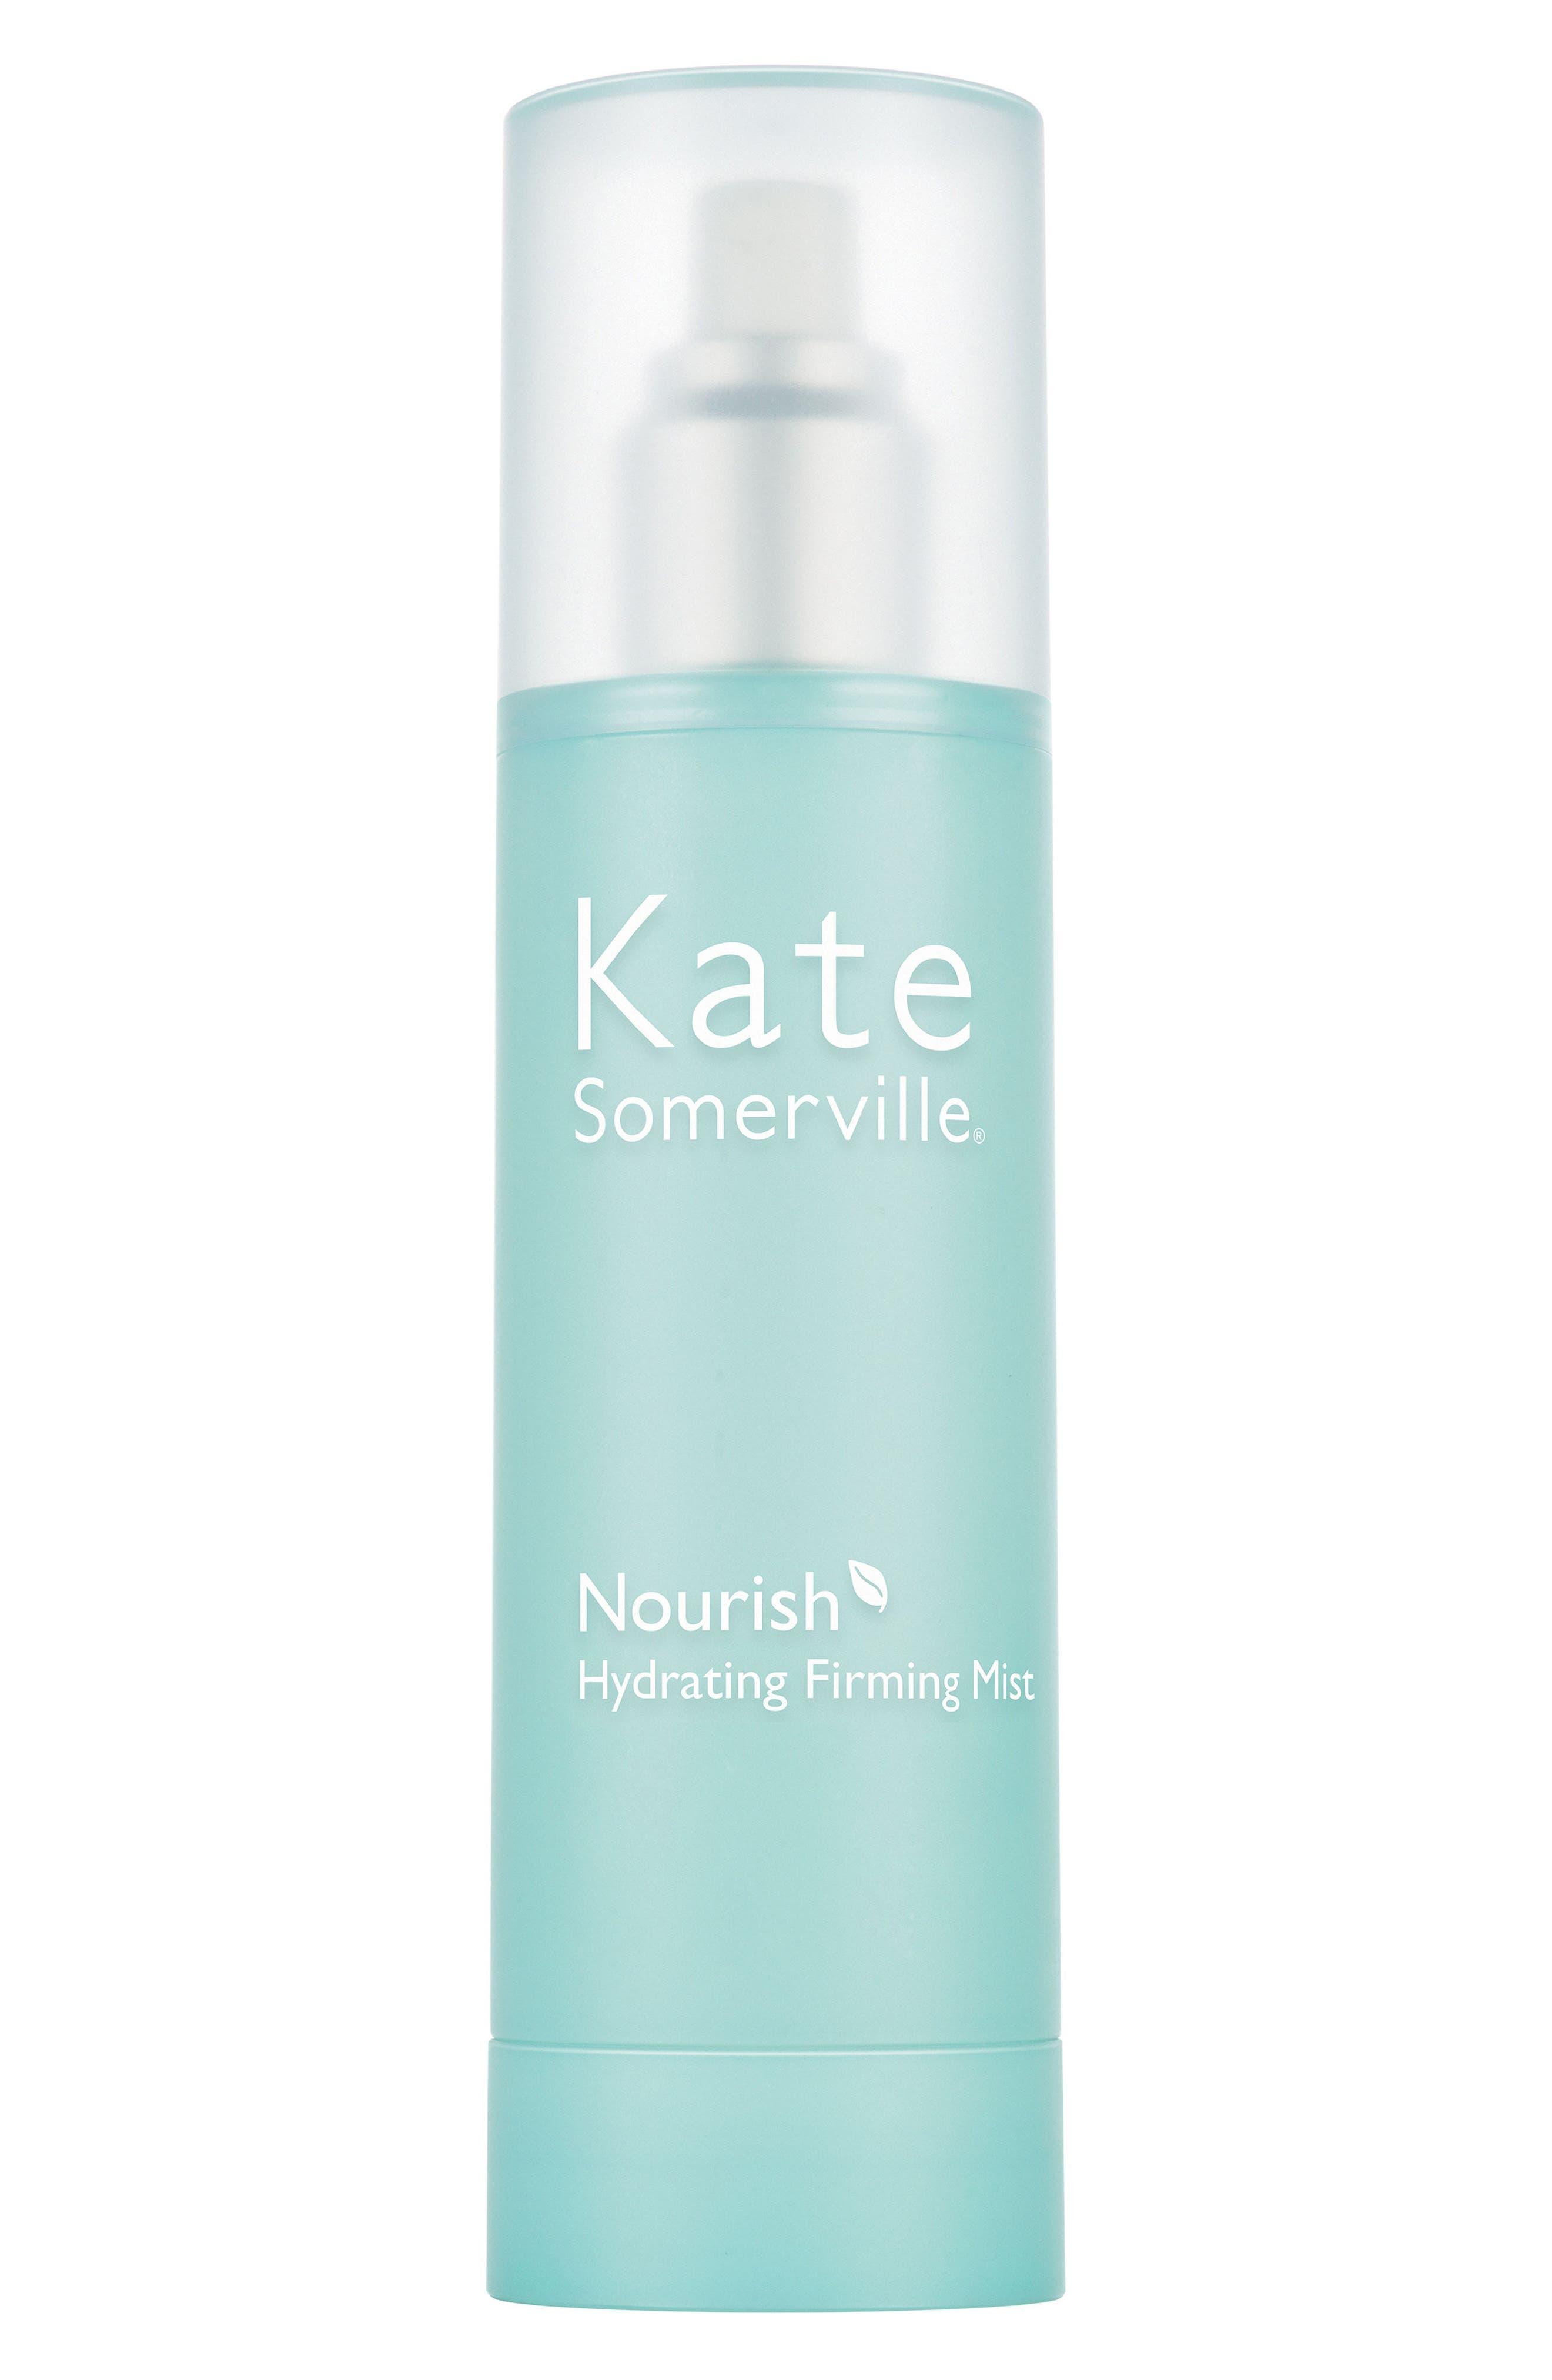 Alternate Image 1 Selected - Kate Somerville® 'Nourish' Hydrating Firming Mist